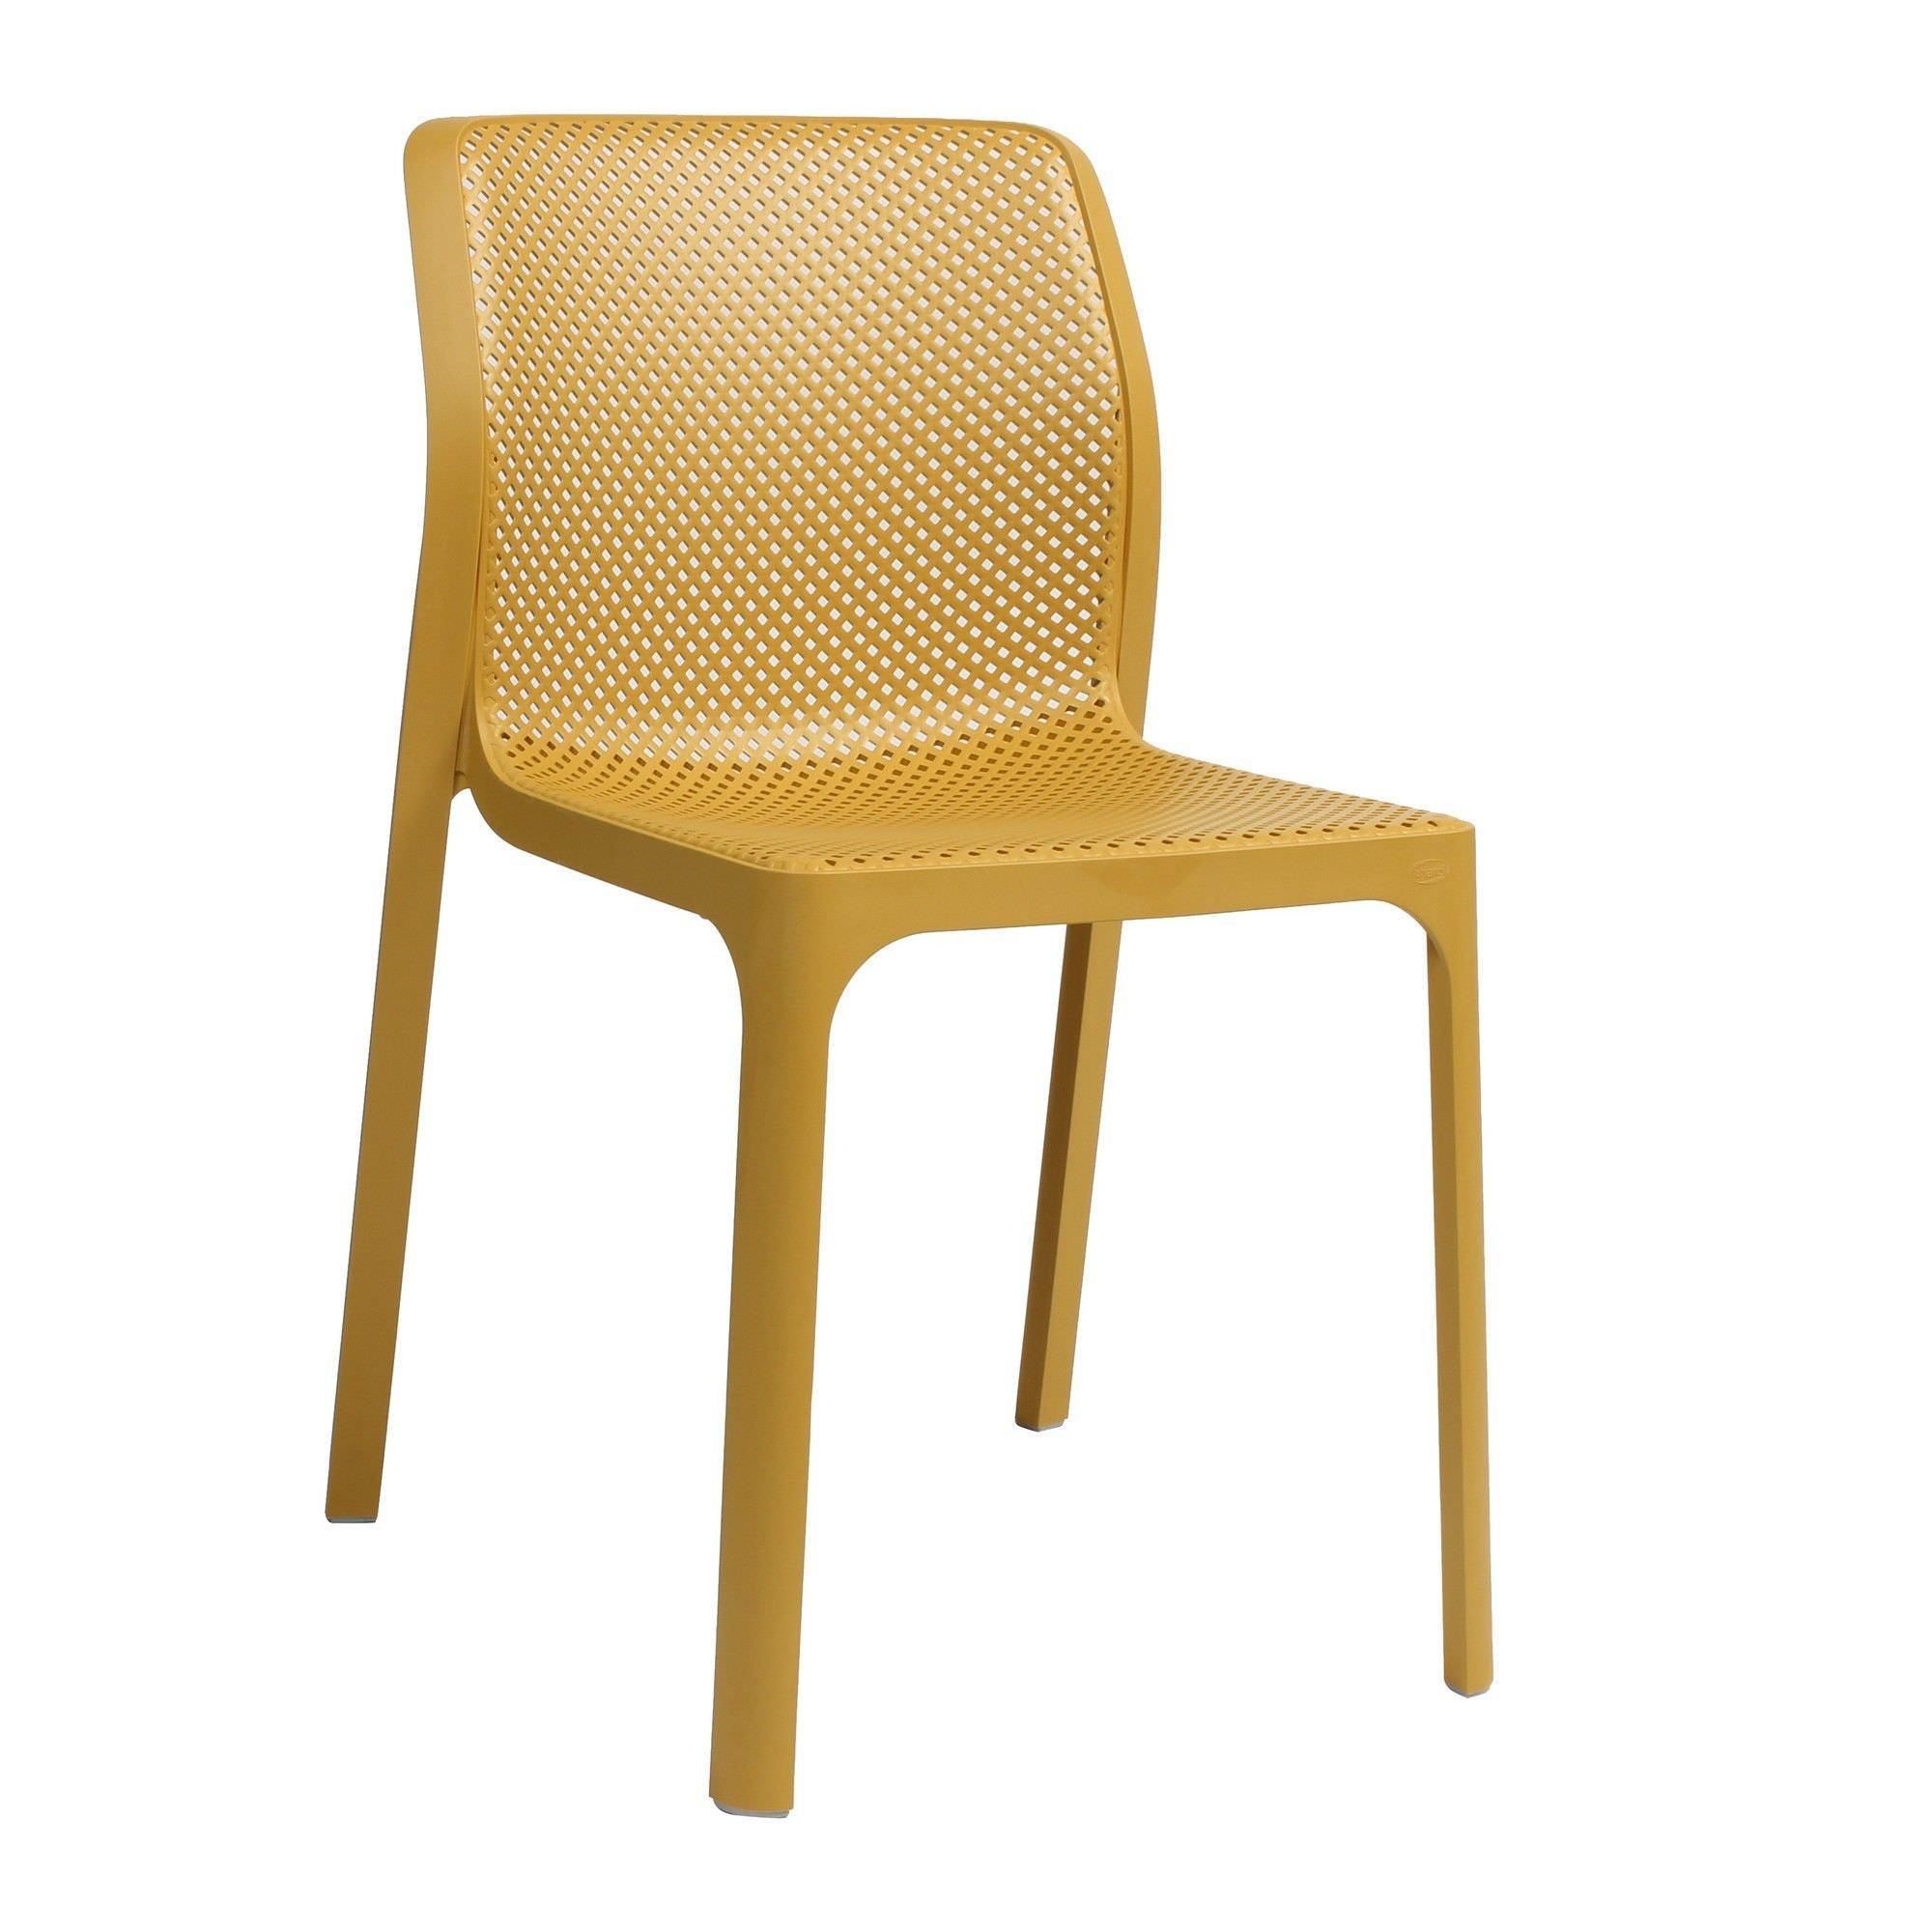 Bit Italian Made Commercial Grade Indoor/Outdoor Dining Chair, Yellow